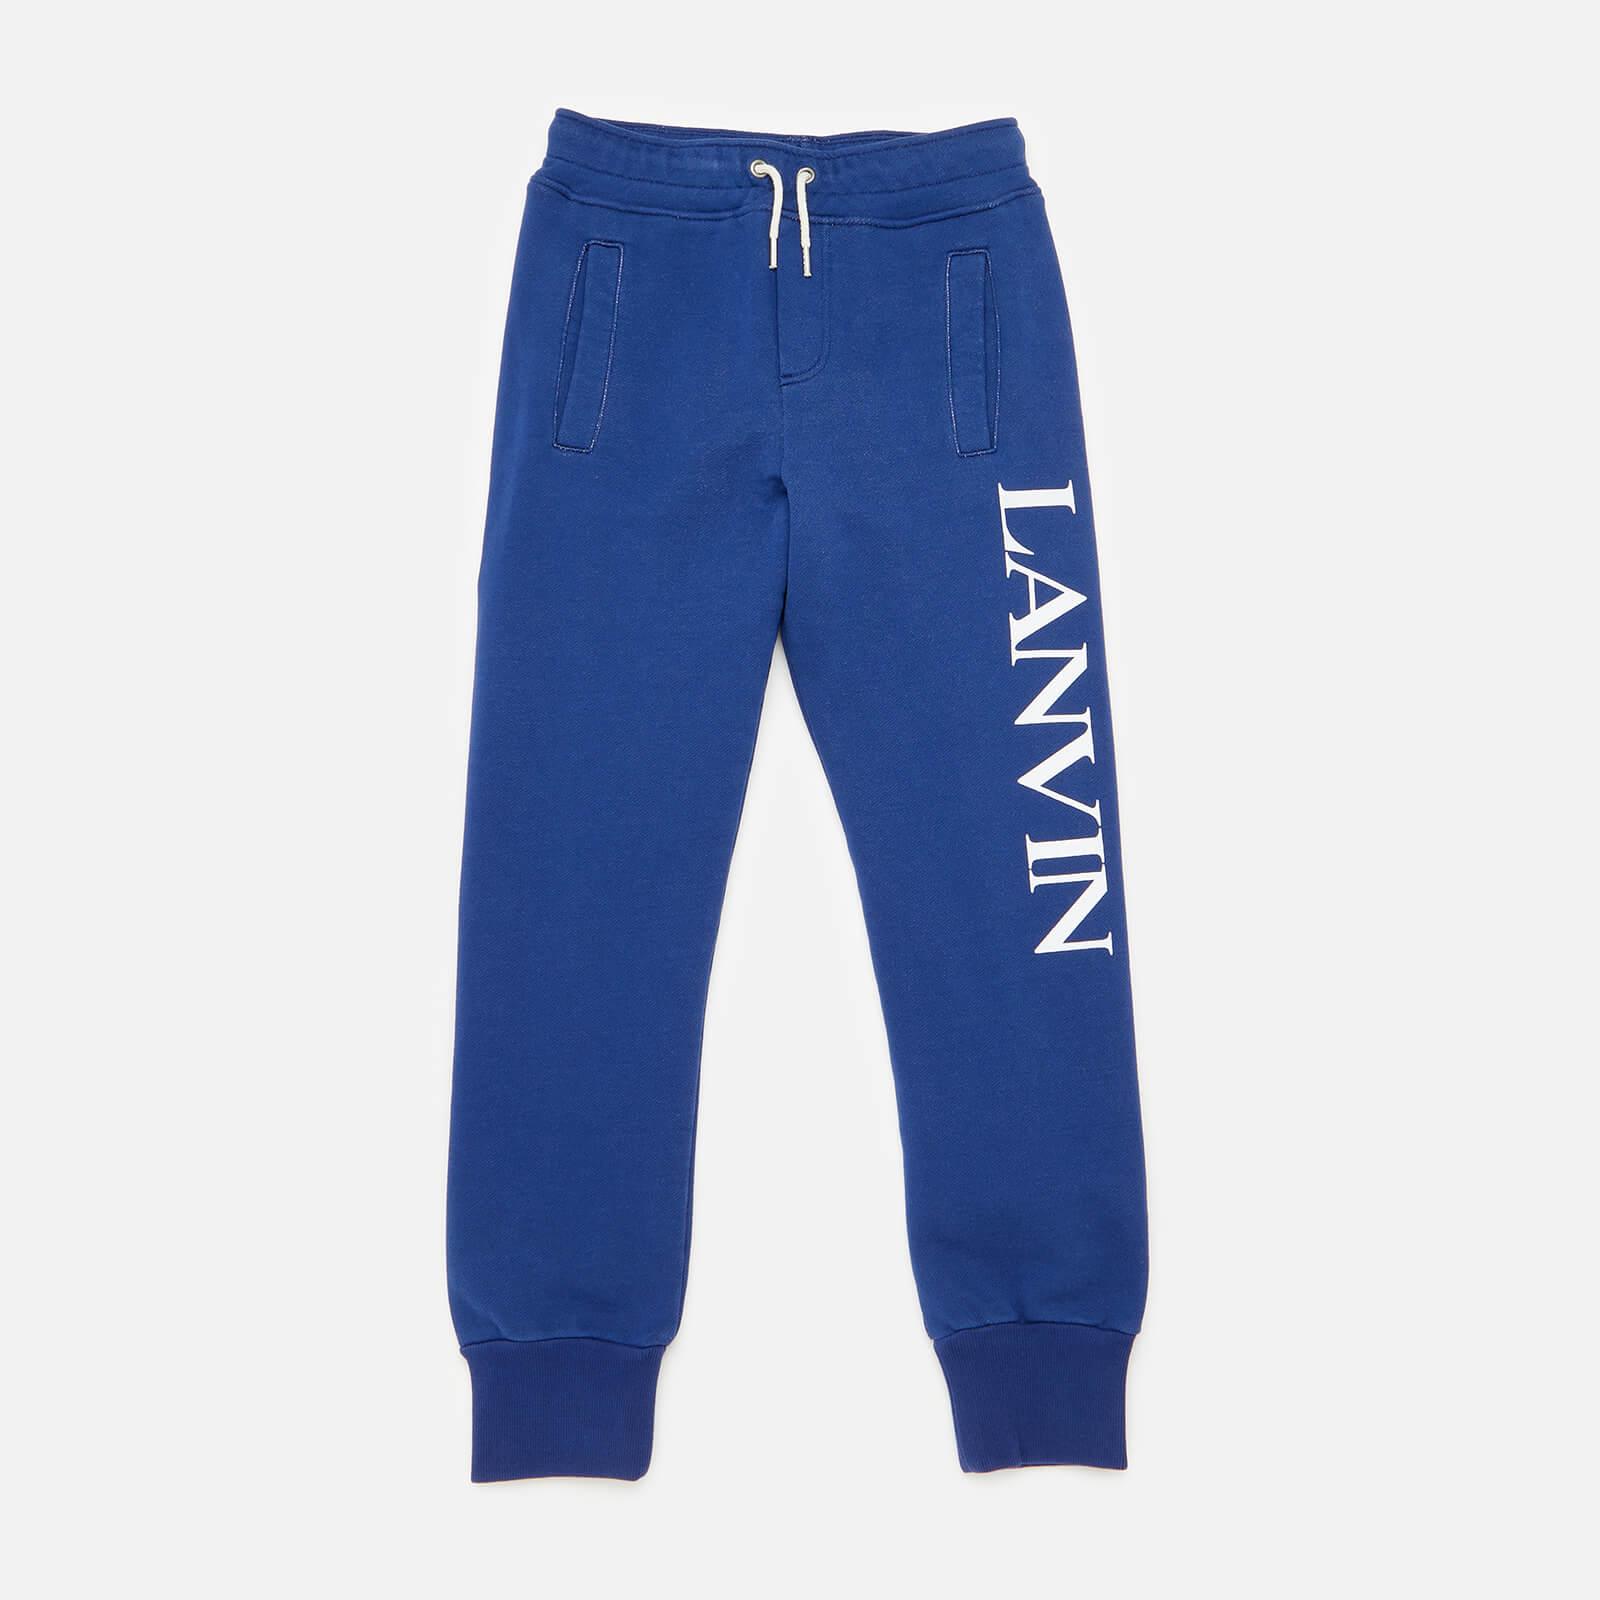 Lanvin Boys' Jogging Bottoms - Denim Blue - 10 Years